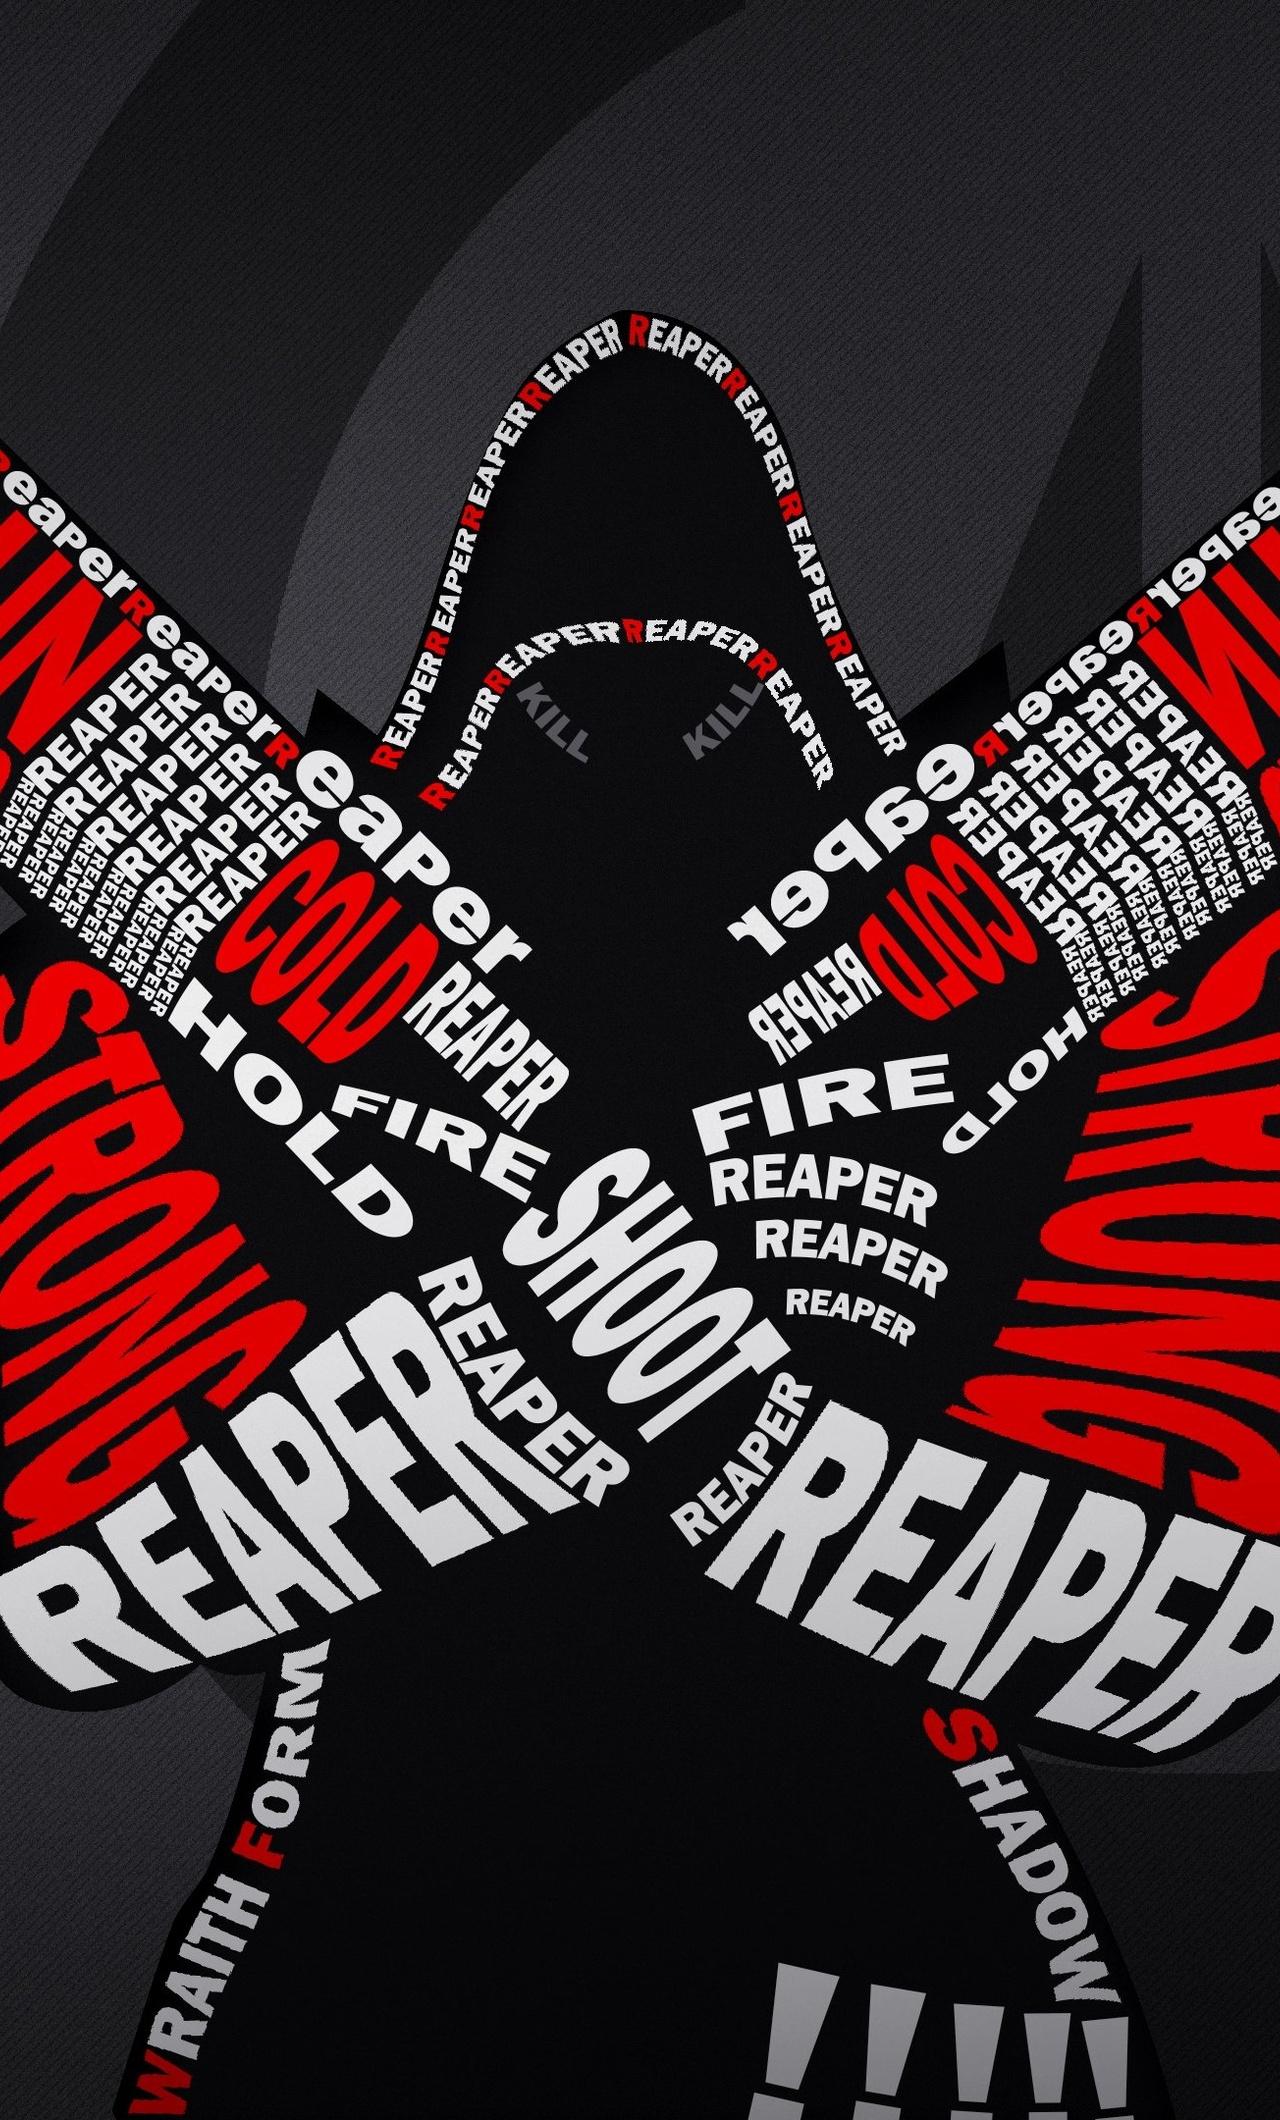 reaper-typography-overwatch-j1.jpg